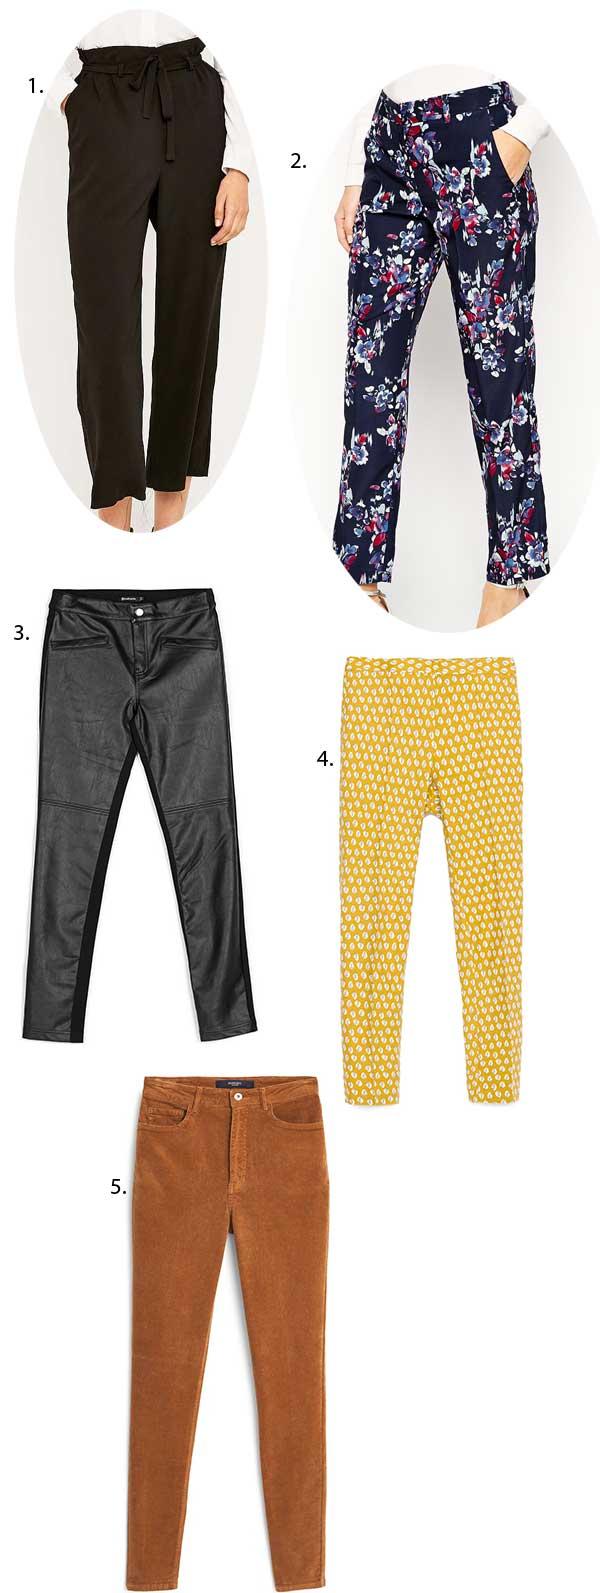 soldes-pantalons